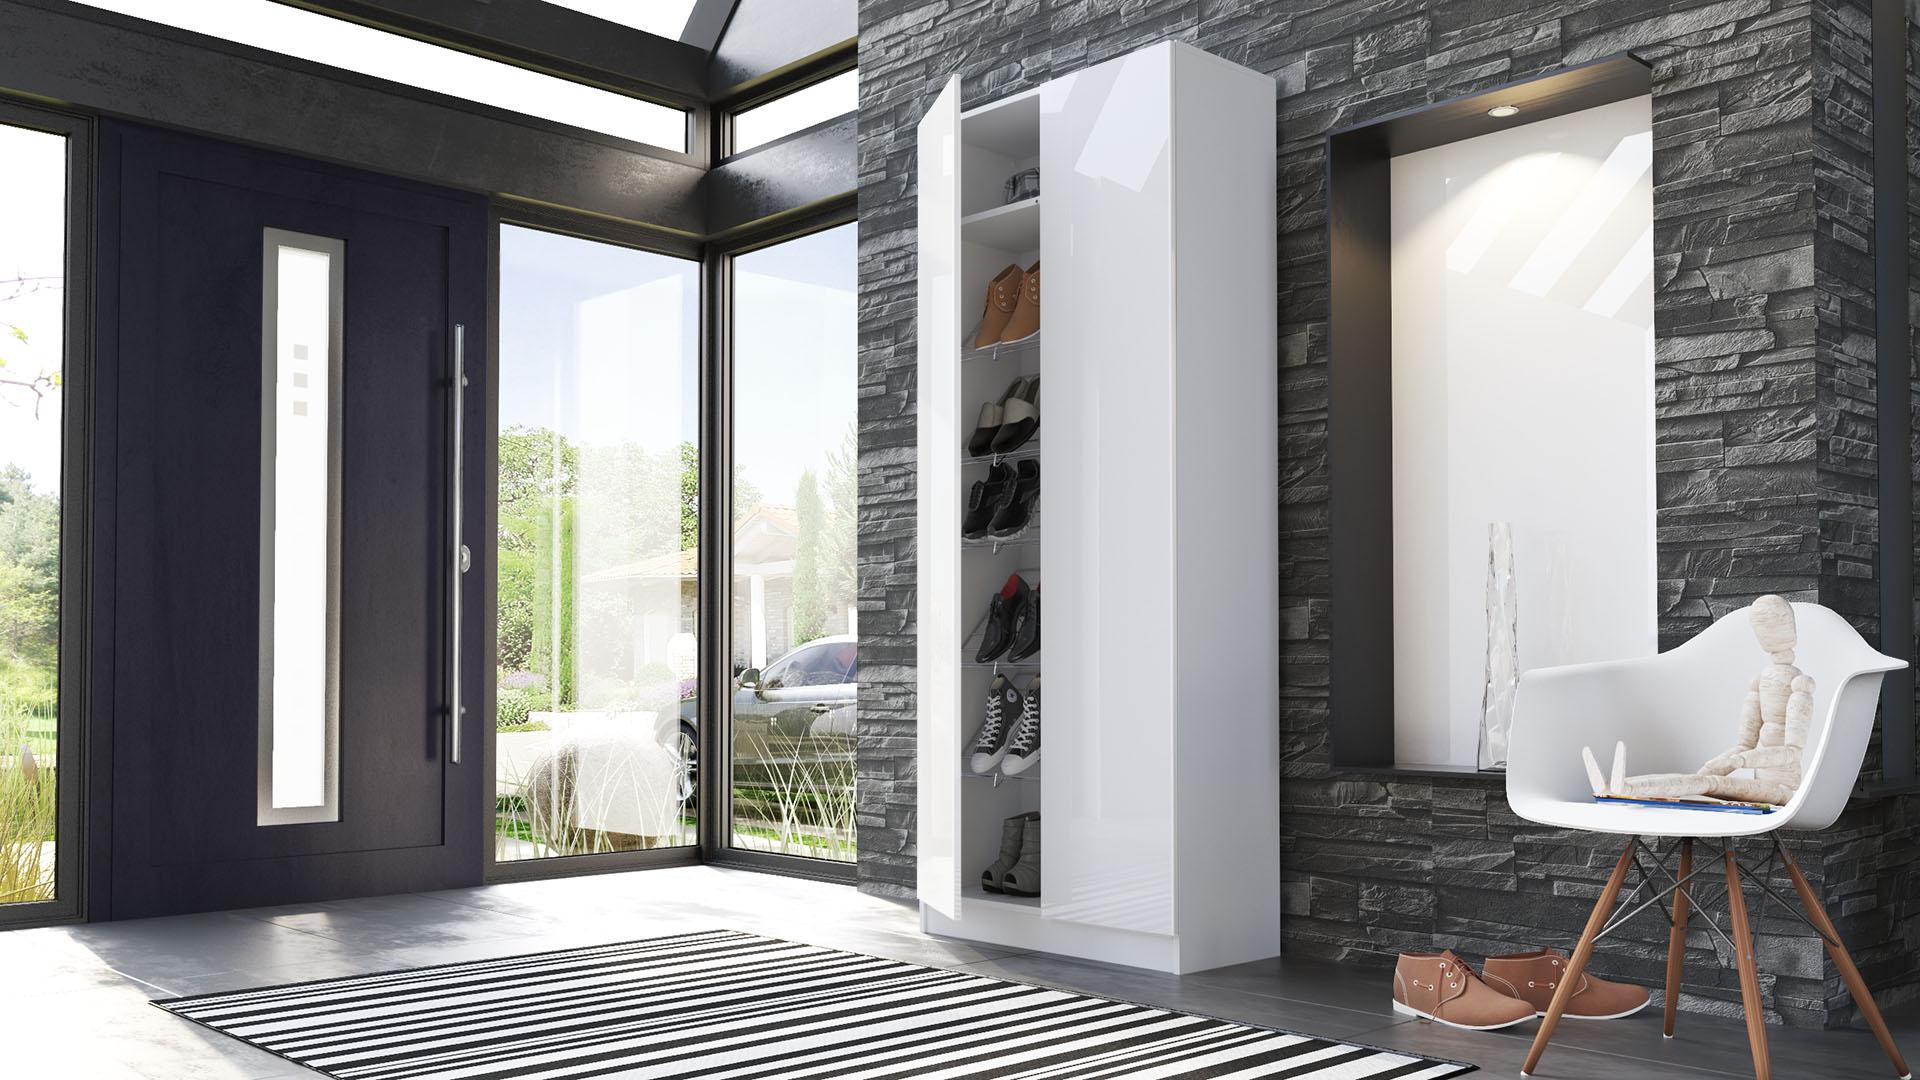 schuhschrank schuhregal diele flur schrank vaasa in wei. Black Bedroom Furniture Sets. Home Design Ideas